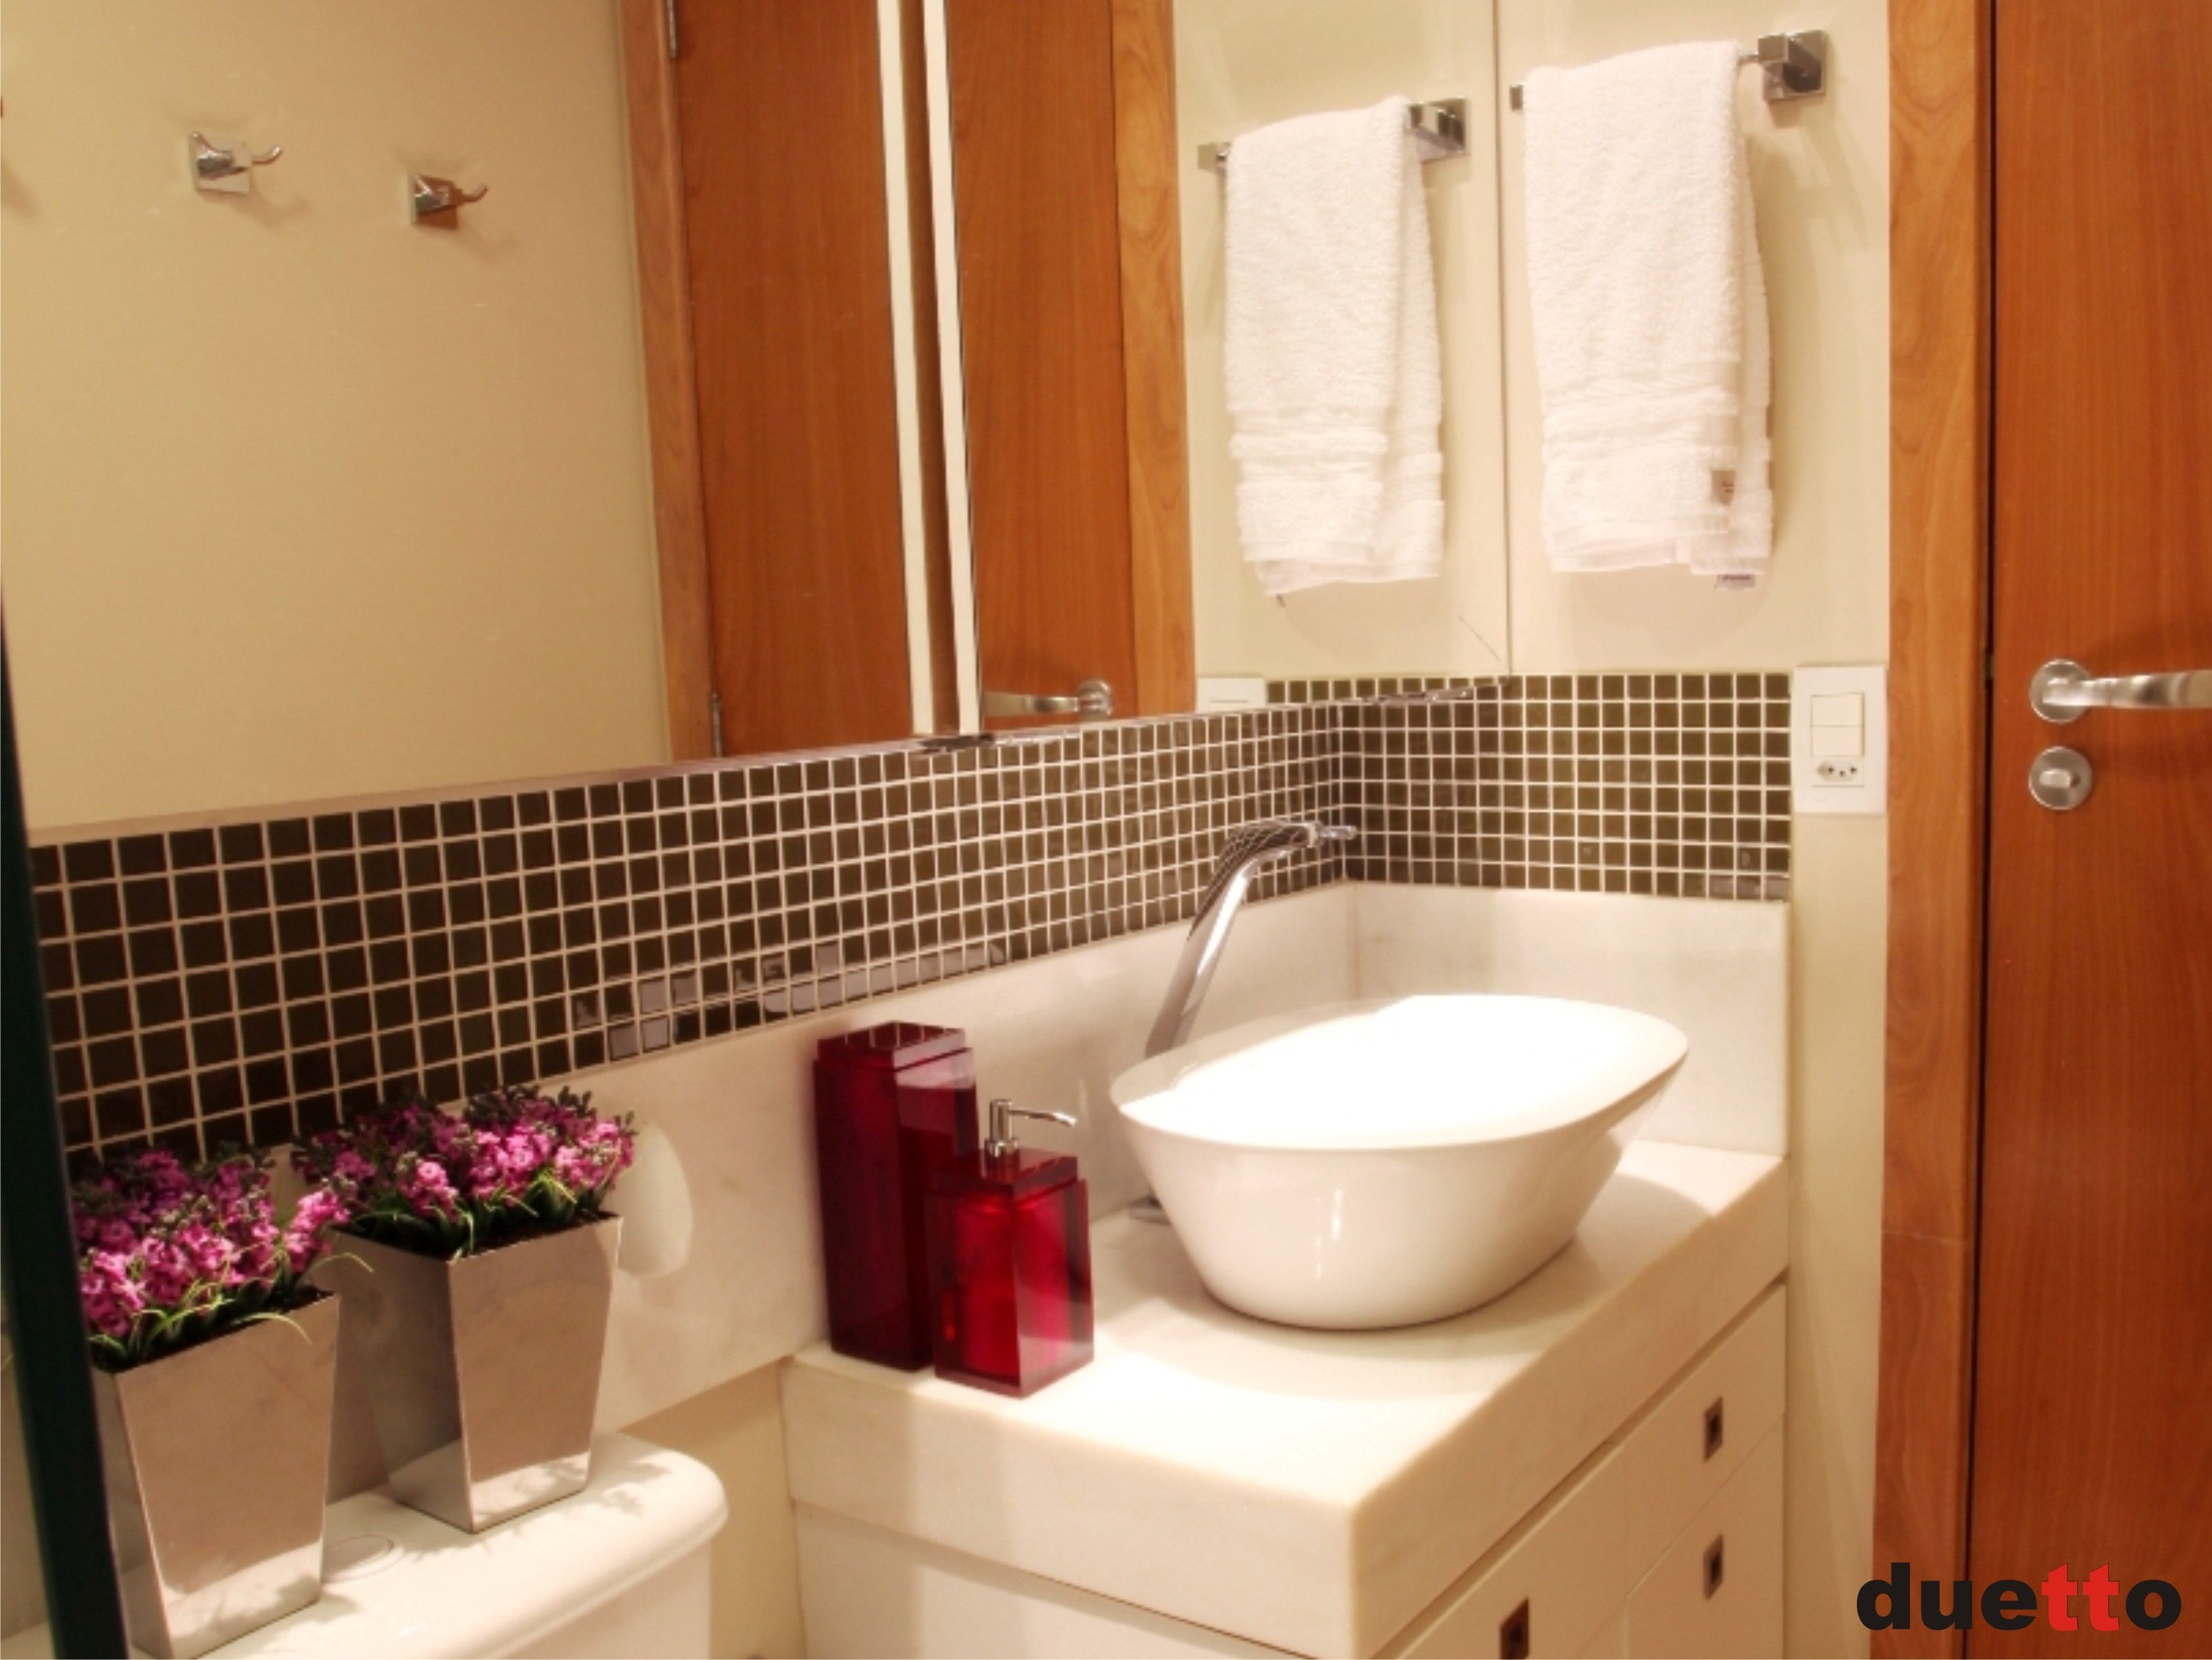 #apartamentopequeno banheiro pequeno e muito fofo  Ideias para Banheiros  P -> Banheiro Muito Pequeno